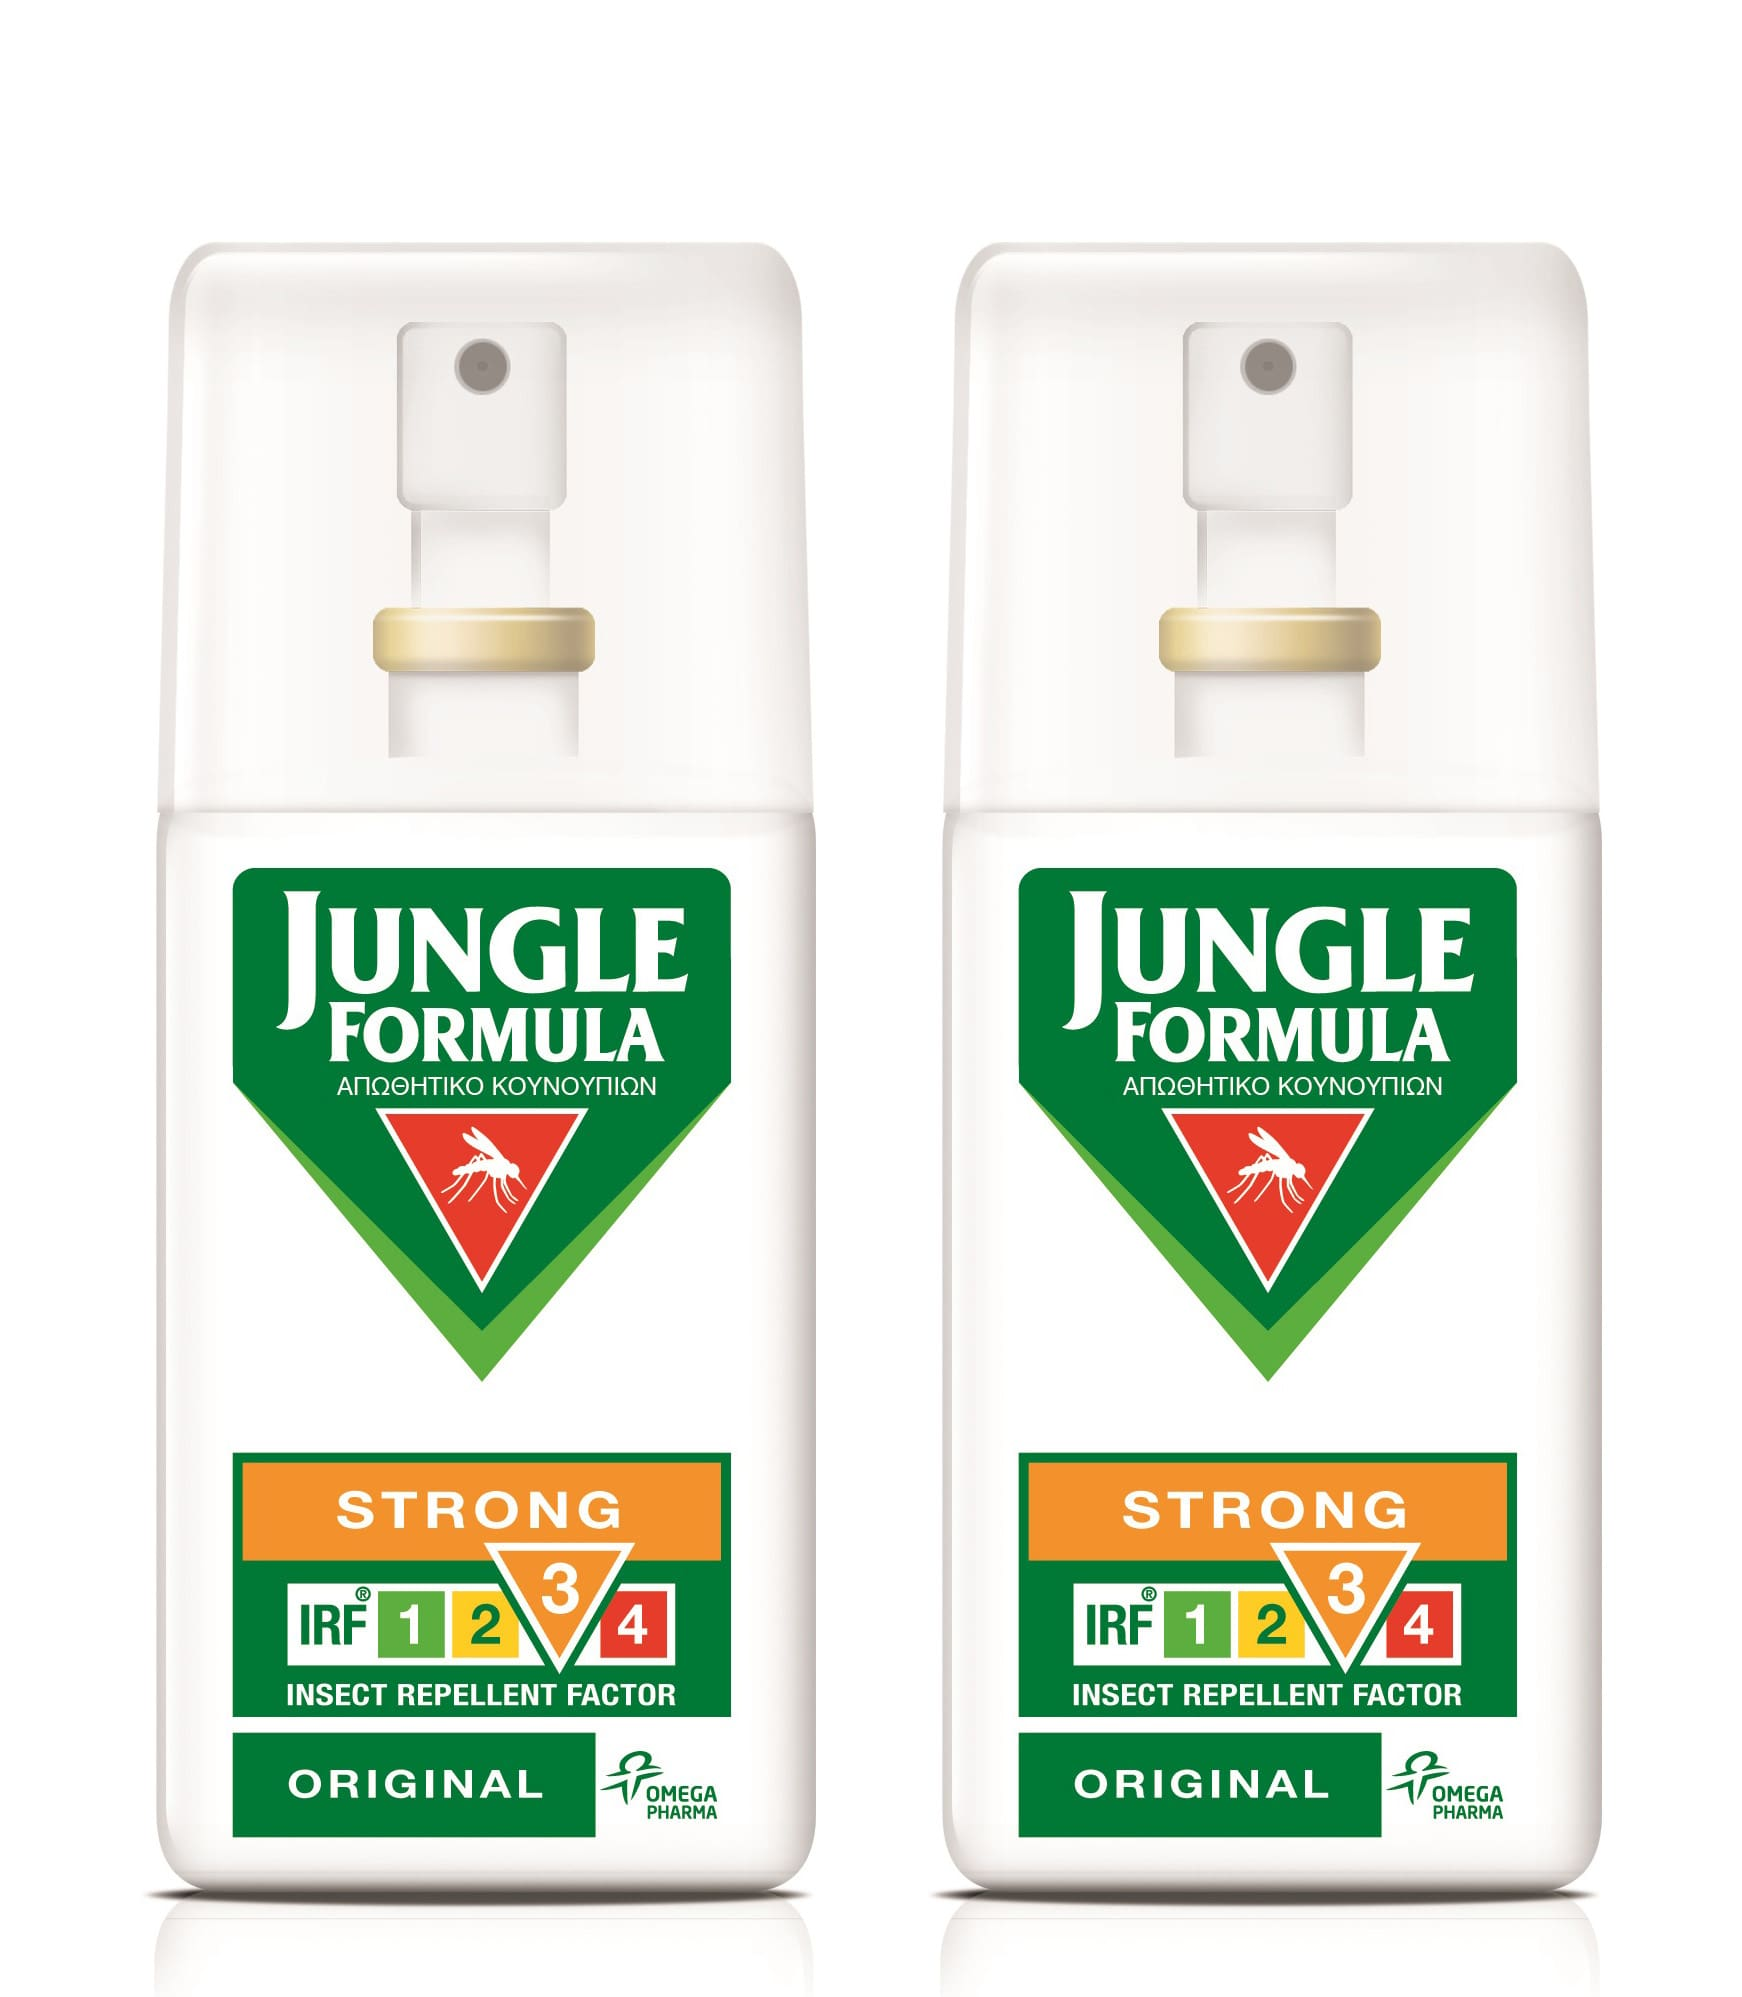 2x Jungle Formula Strong Original Αντικουνουπικό spray με 20% περιεκτικότητα Deet & φυτικά εκχυλίσματα, 2 x 75ml